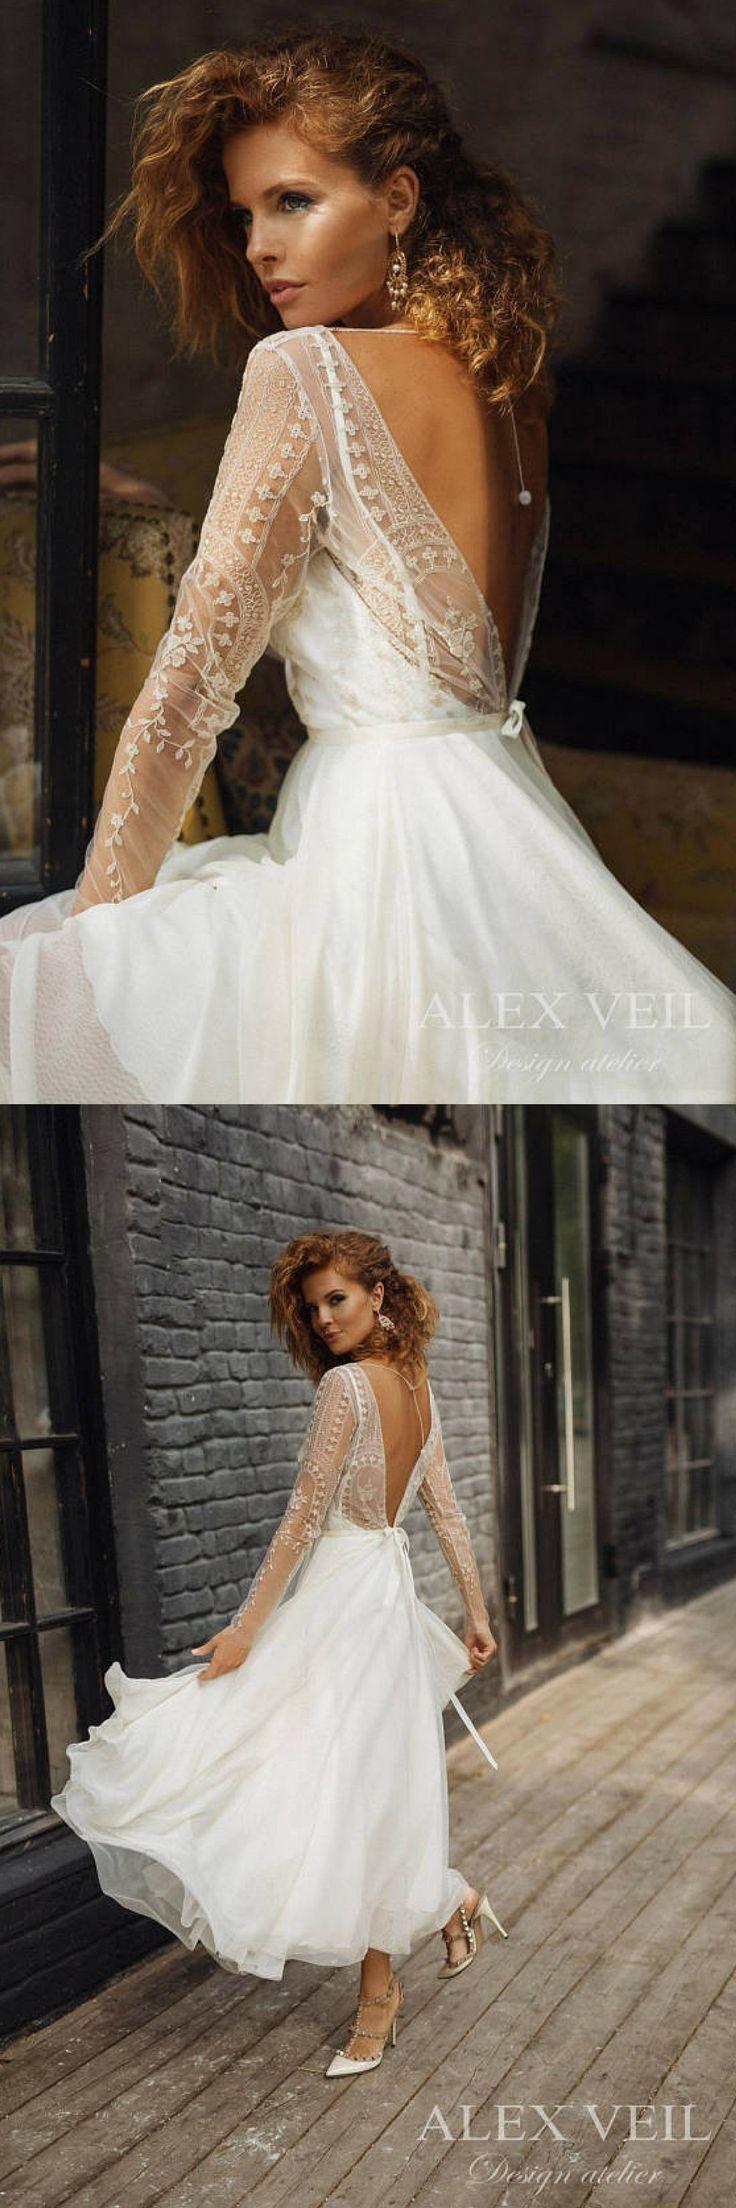 Wedding dress 'ELISE' //  short wedding dress, boneless, tea length wedding dress, lace wedding  dress, long sleeve, boho wedding dress  #weddingideas #ad #weddingdresses #rusticwedding